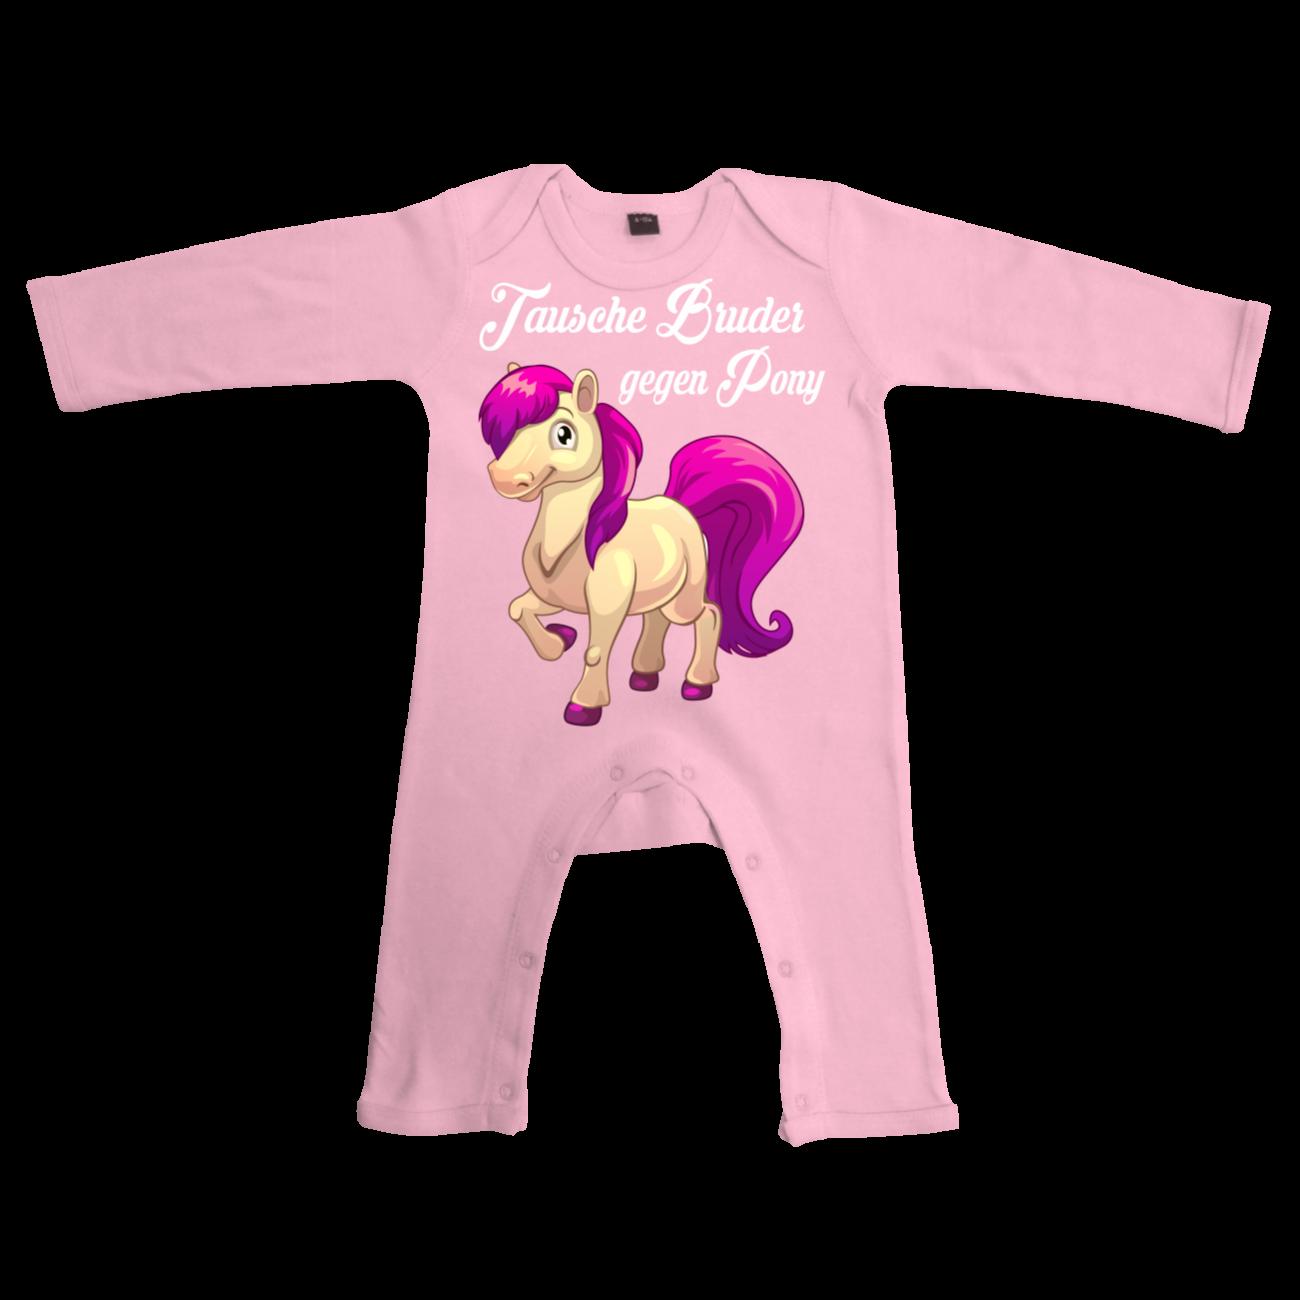 baby strampler lang tausche bruder gegen pony motive geschenk